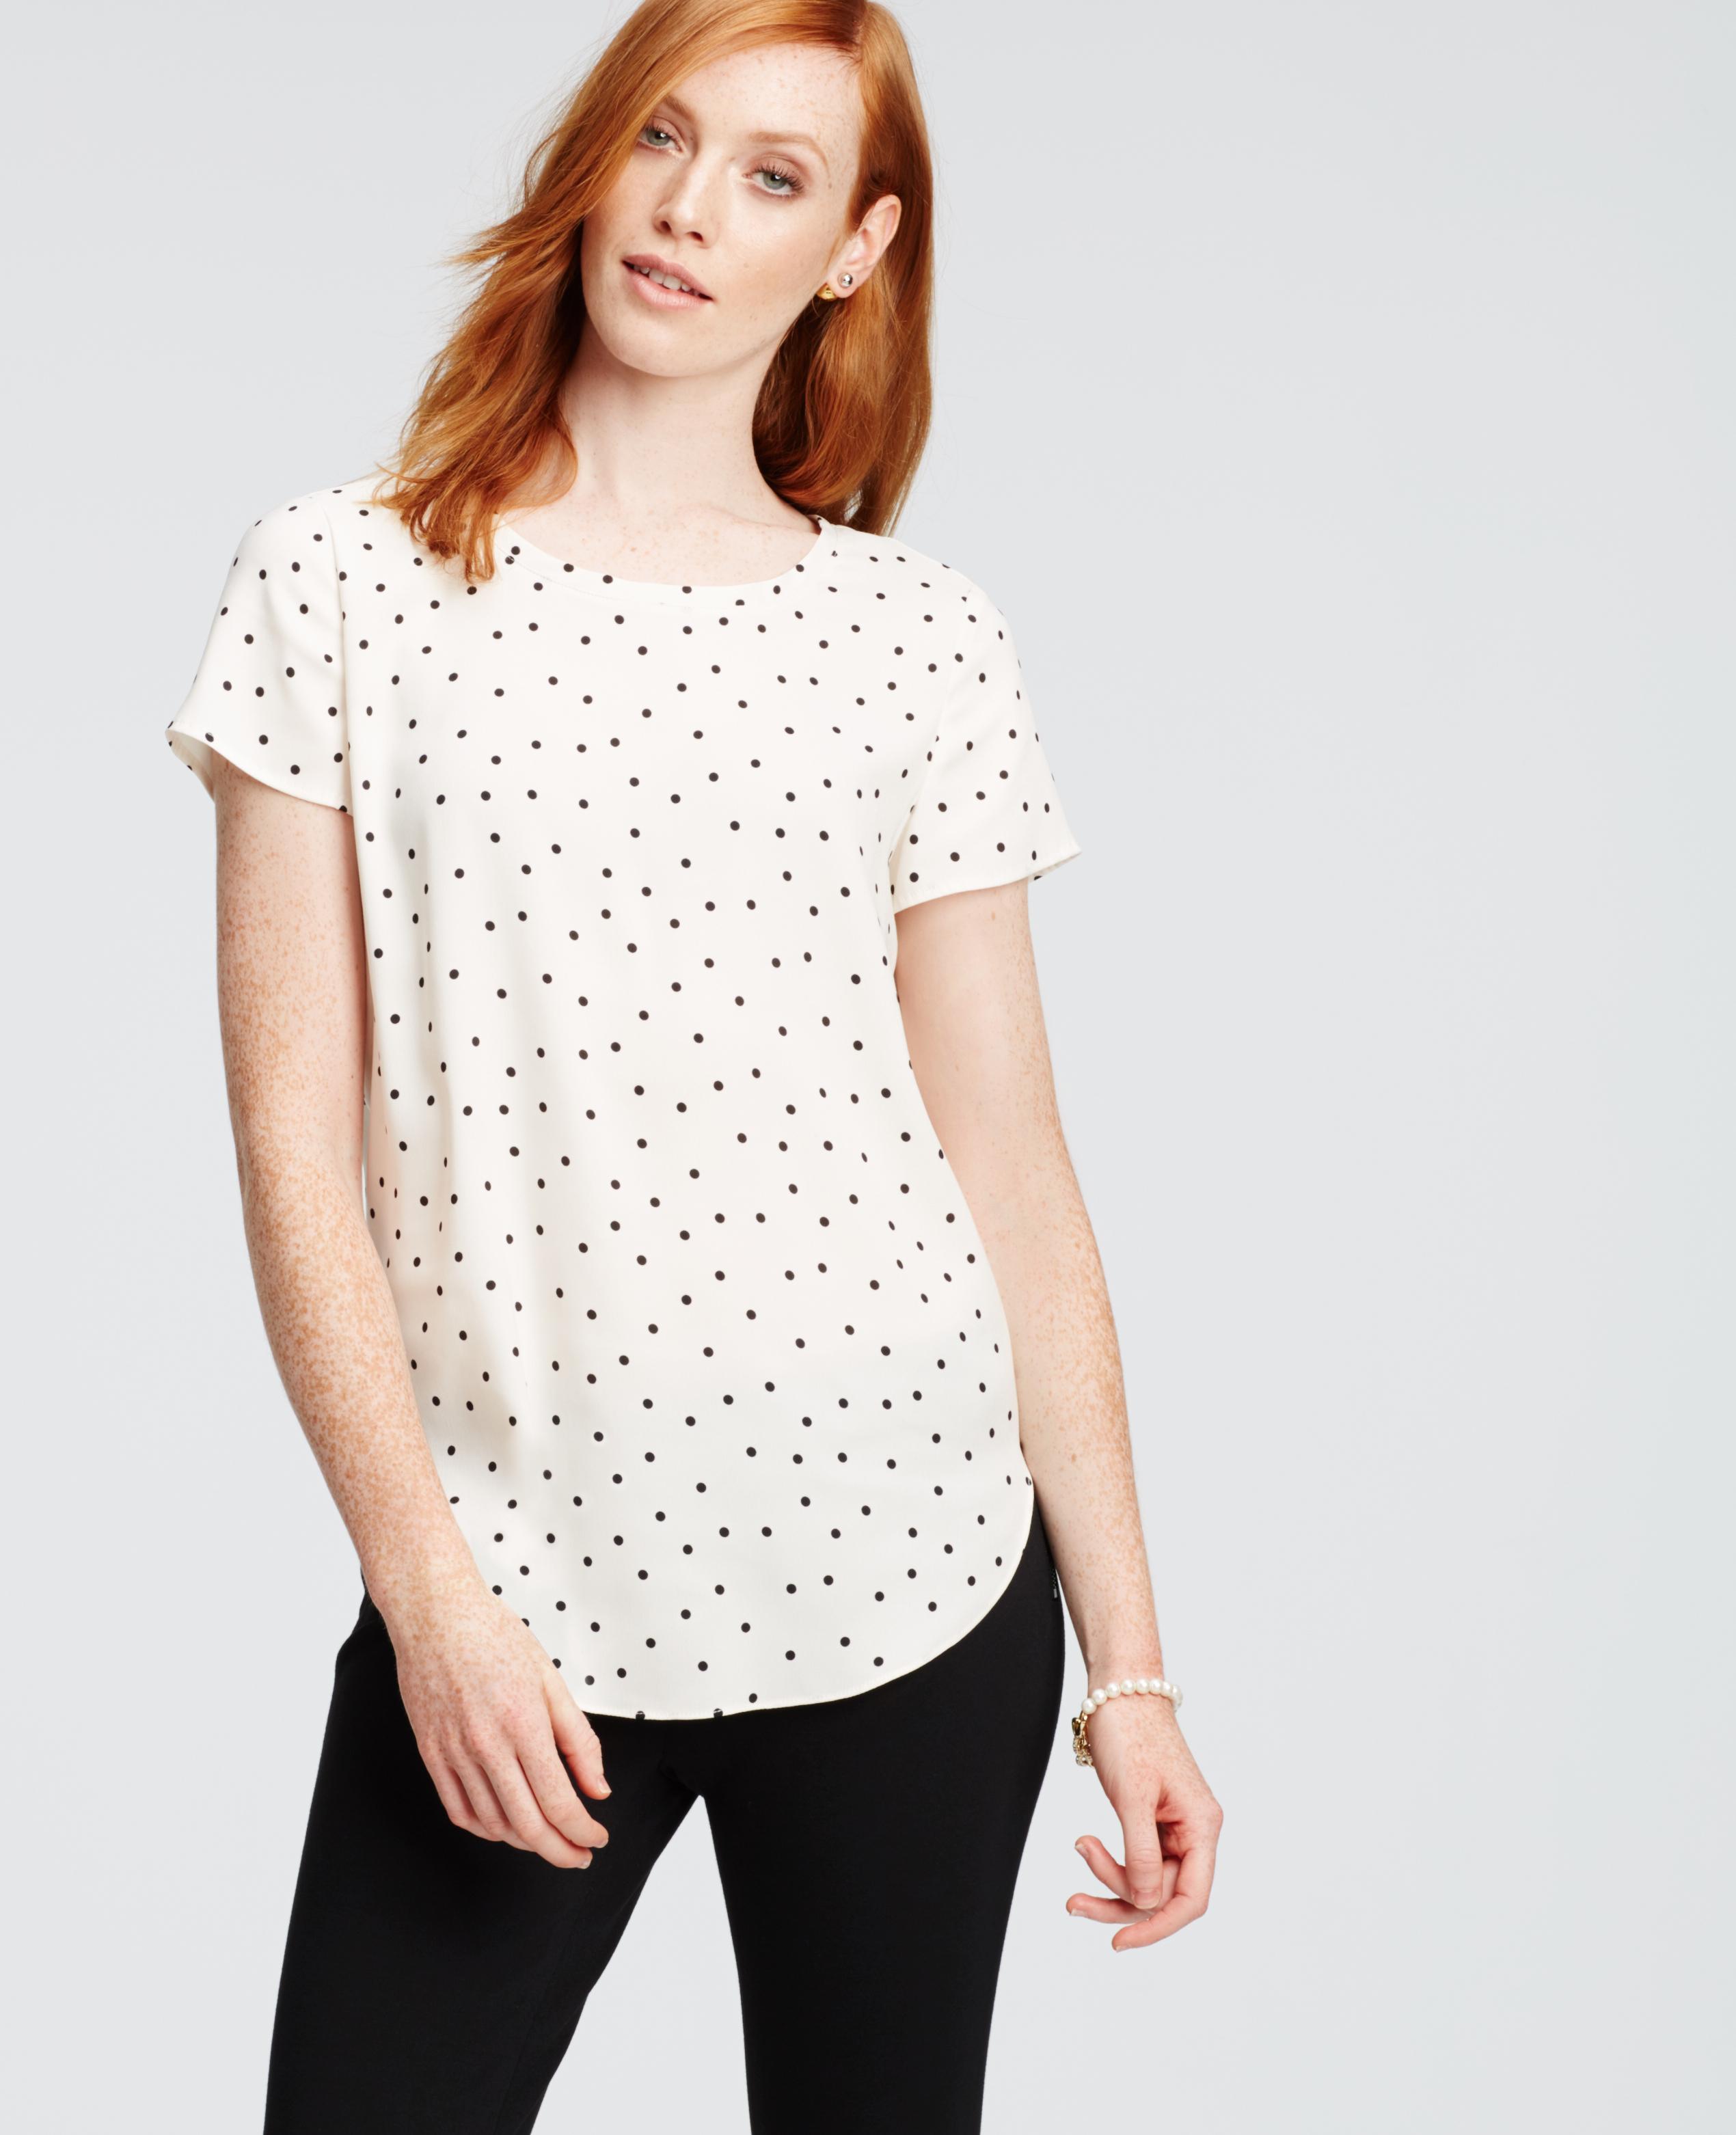 Short Sleeve Polka Dot Blouse Breeze Clothing